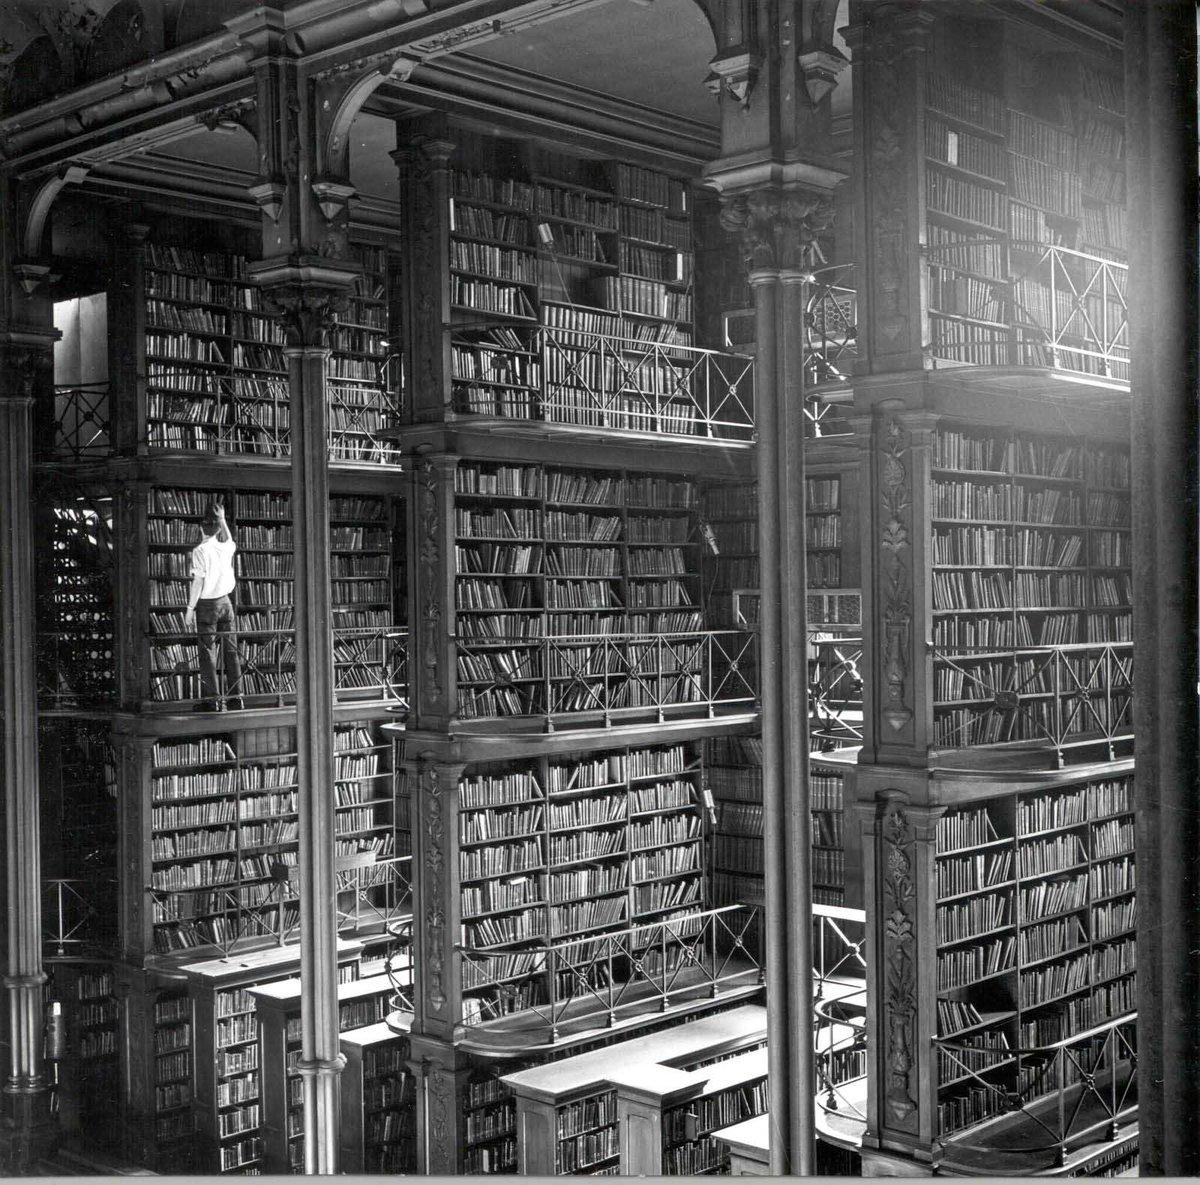 The Old Cincinnati Library before being demolished, 1874-1955.